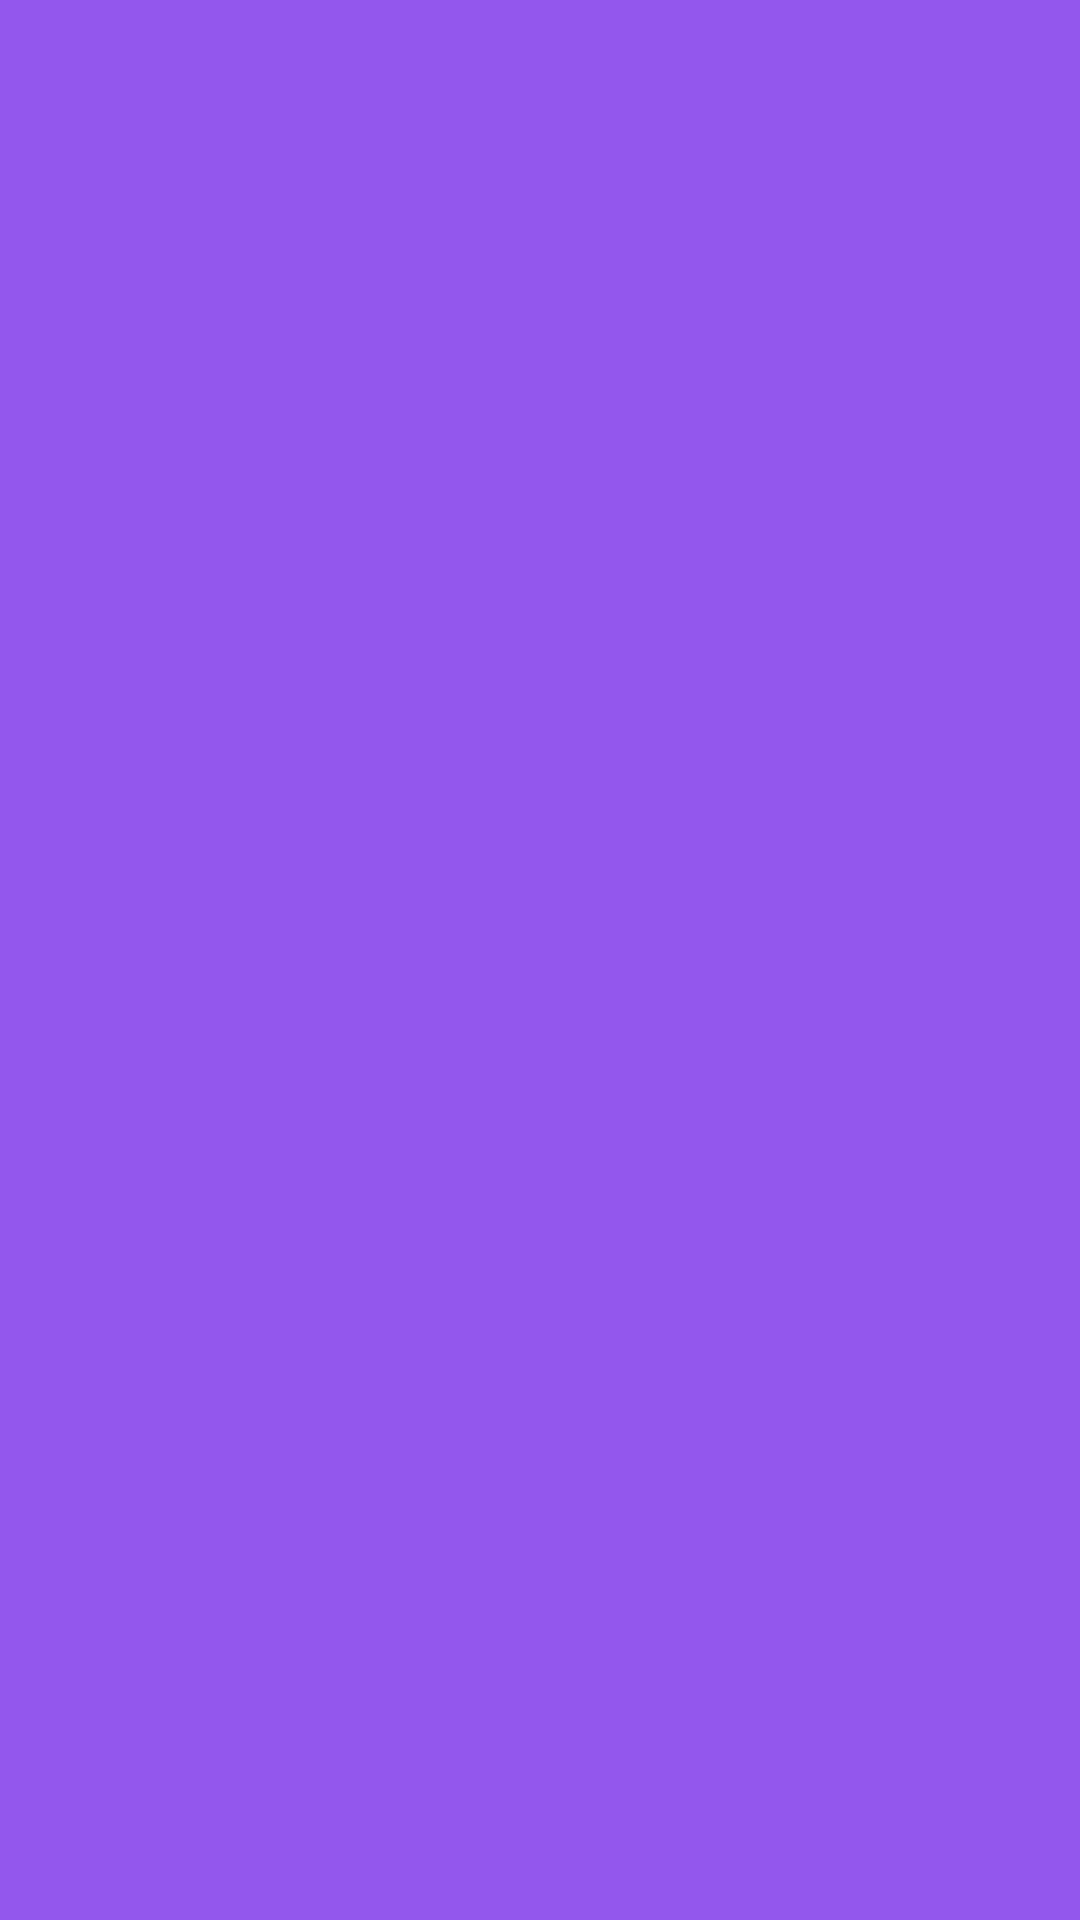 1080x1920 Lavender Indigo Solid Color Background